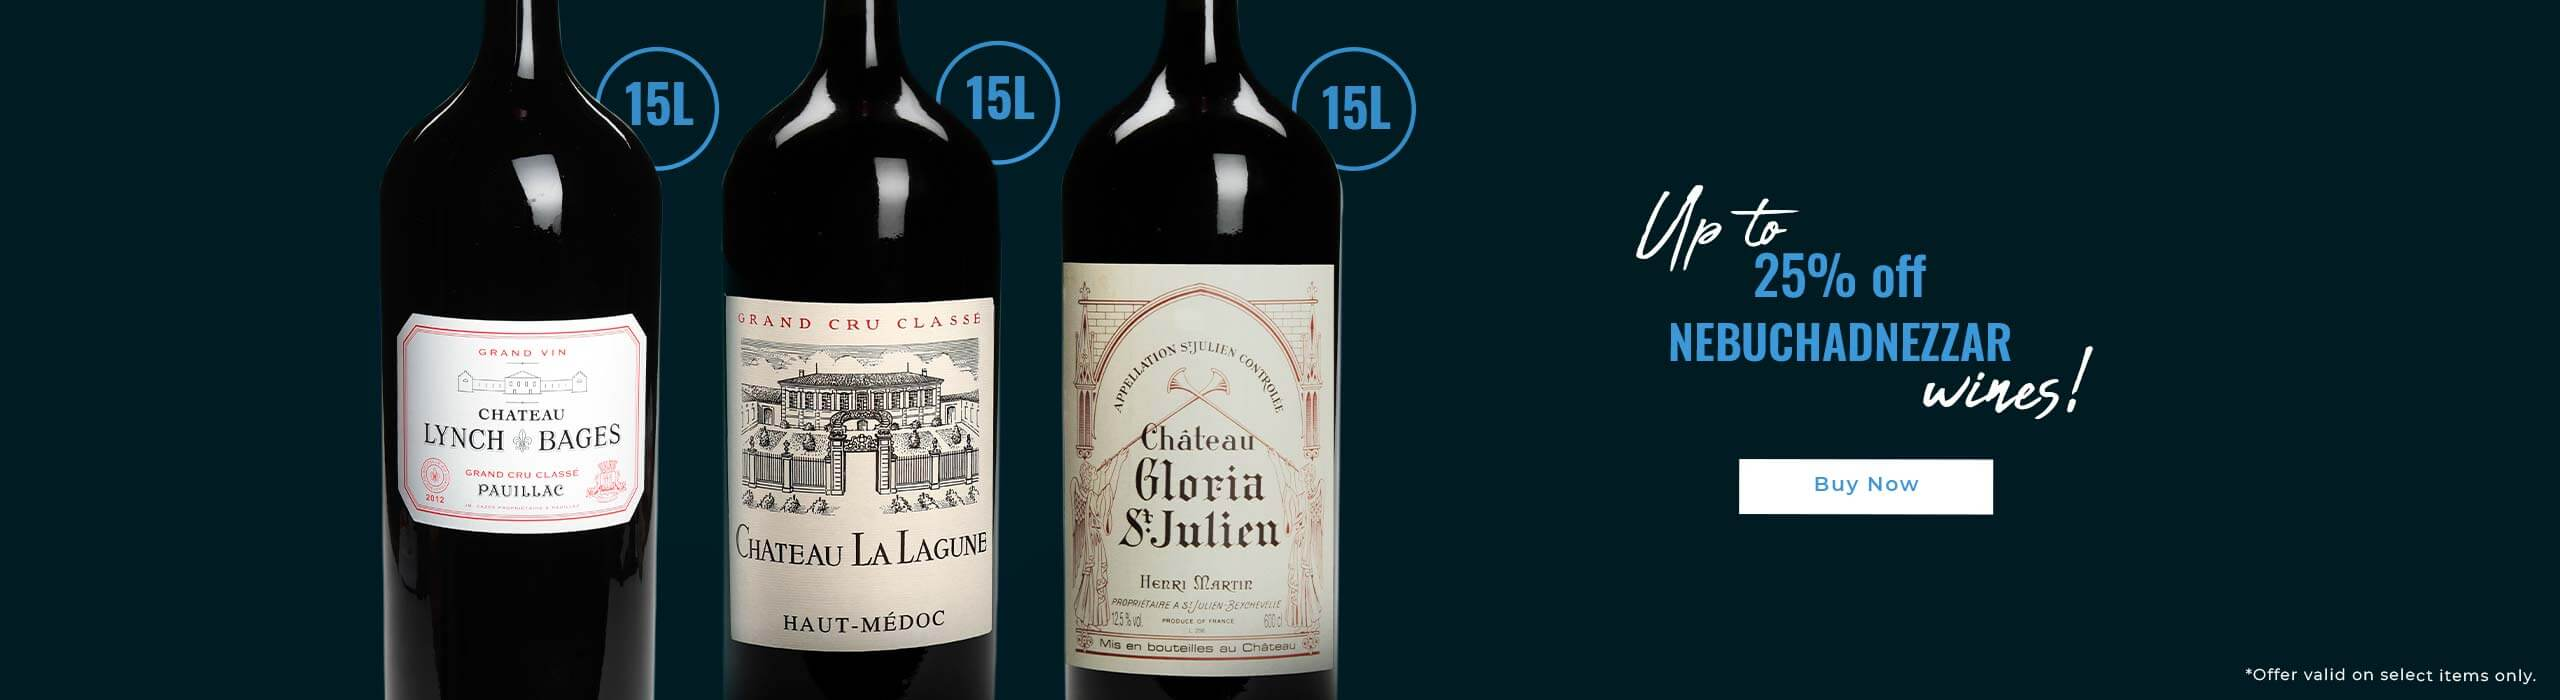 Up to 25% off Nebuchadnezzar wines